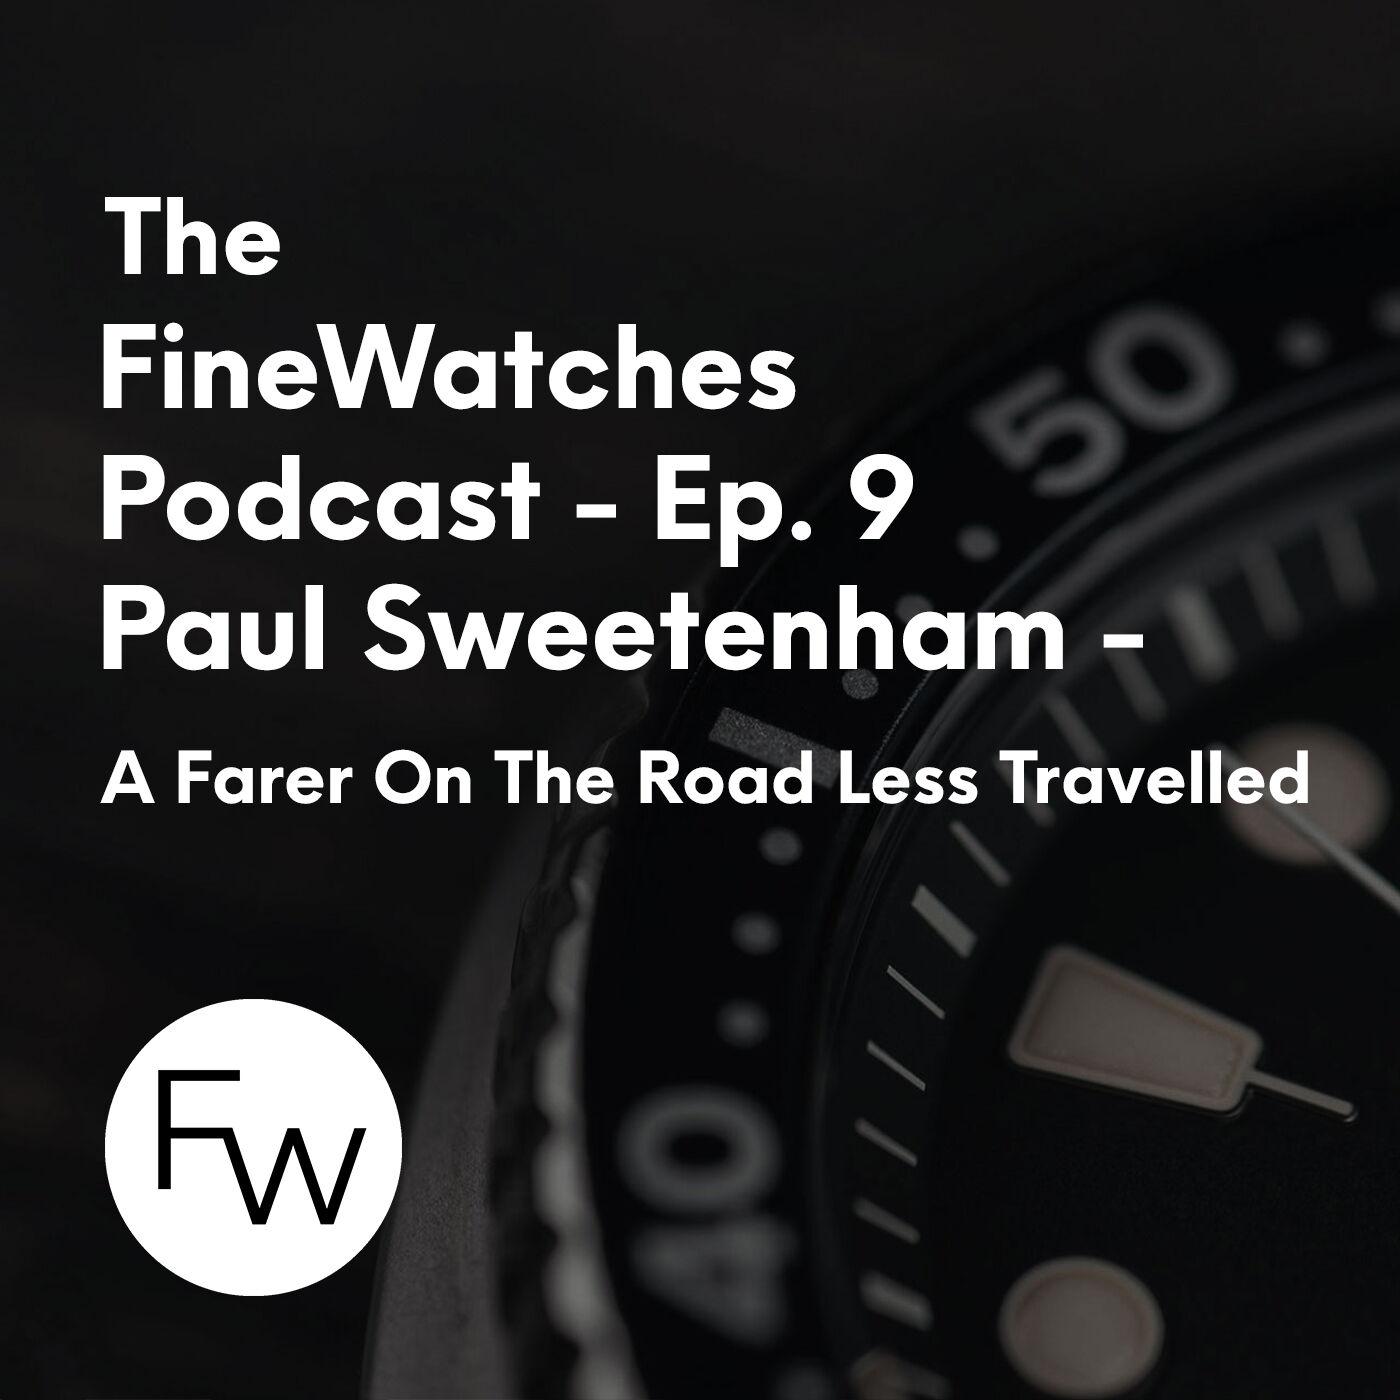 A Farer On The Road Less Travelled - Paul Sweetenham